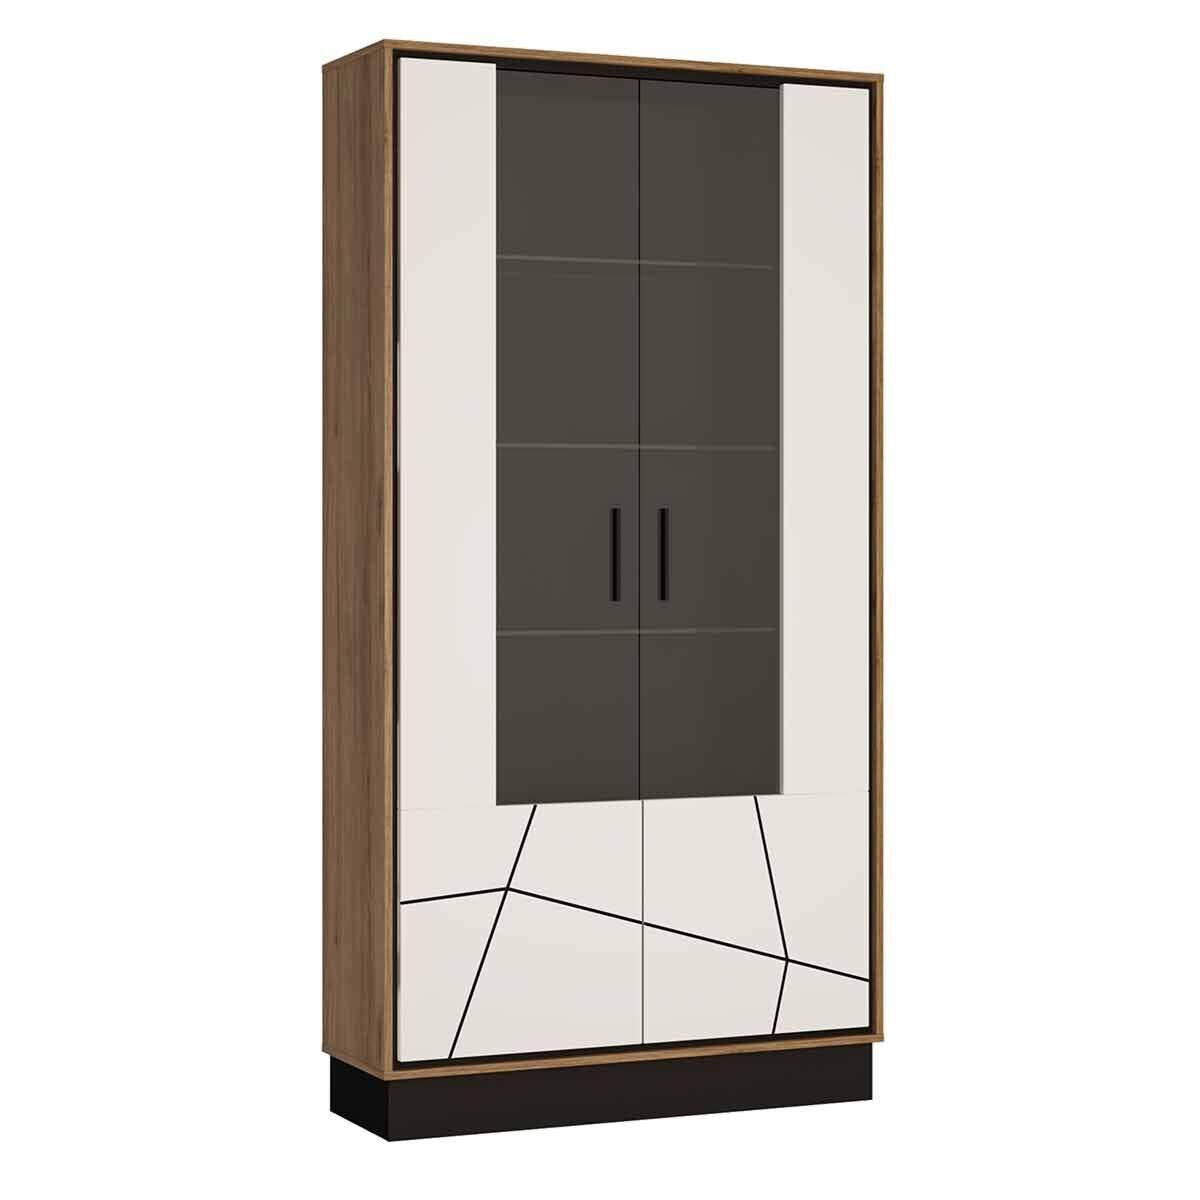 Brolo Tall Wide Glazed Display Cabinet